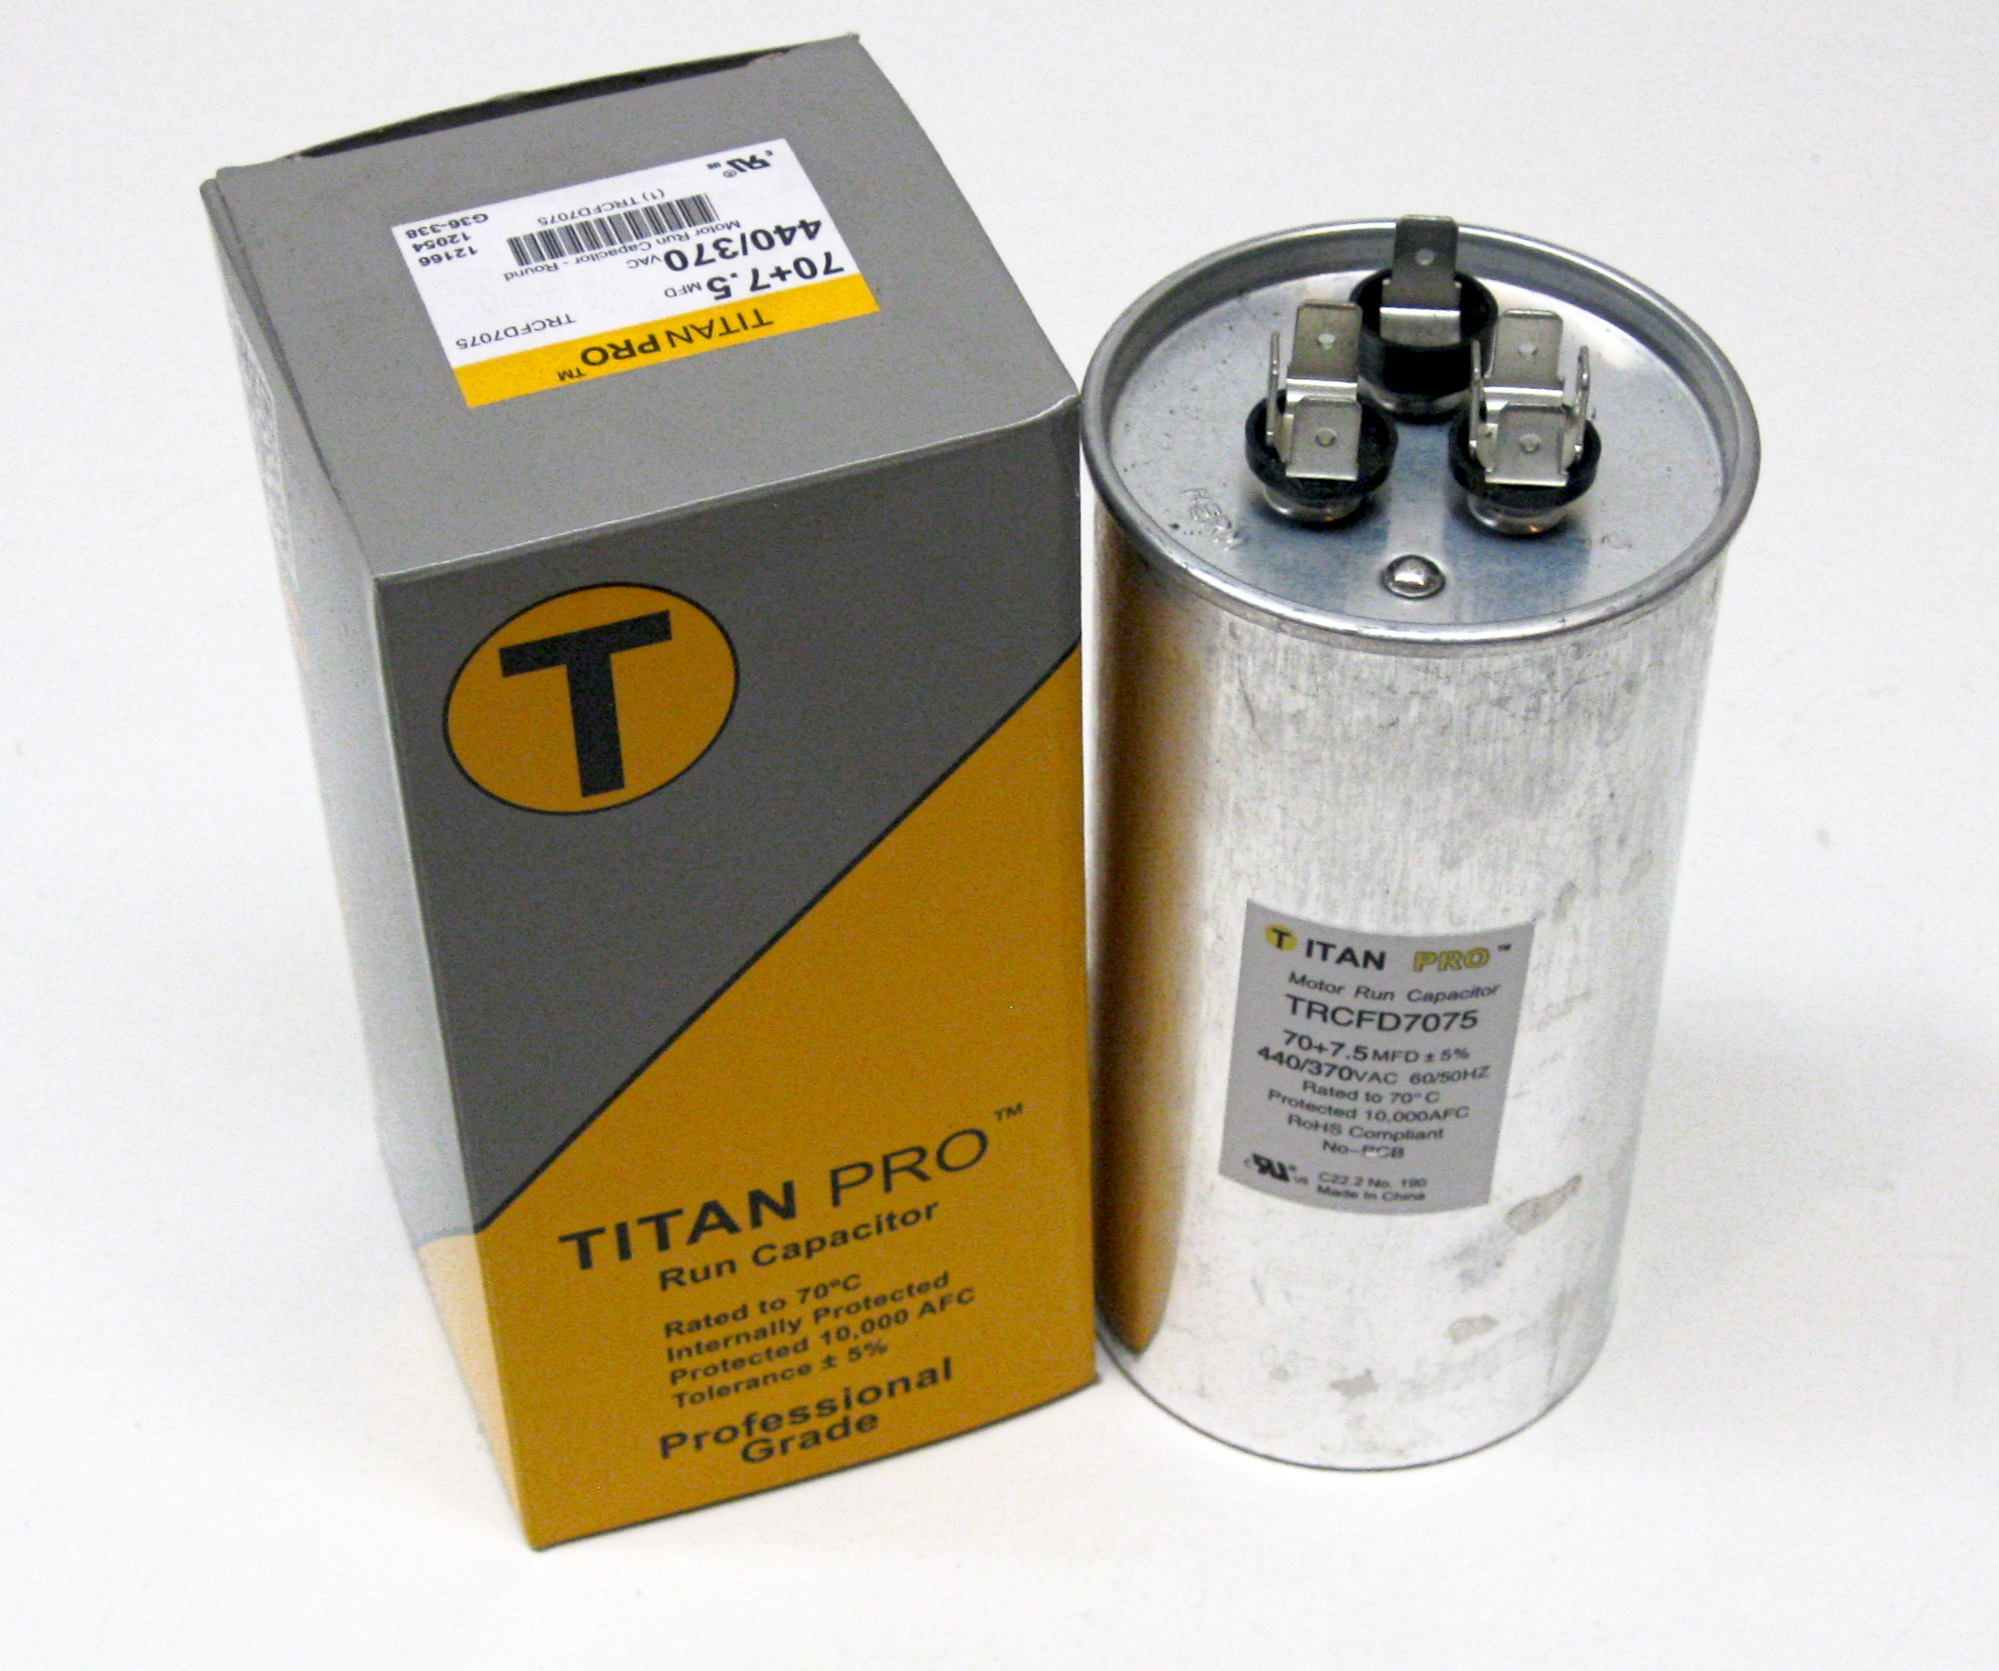 TitanPro TRCFD5575 HVAC Round Dual Motor Run Capacitor 55//7.5 MFD 440//370 Volts